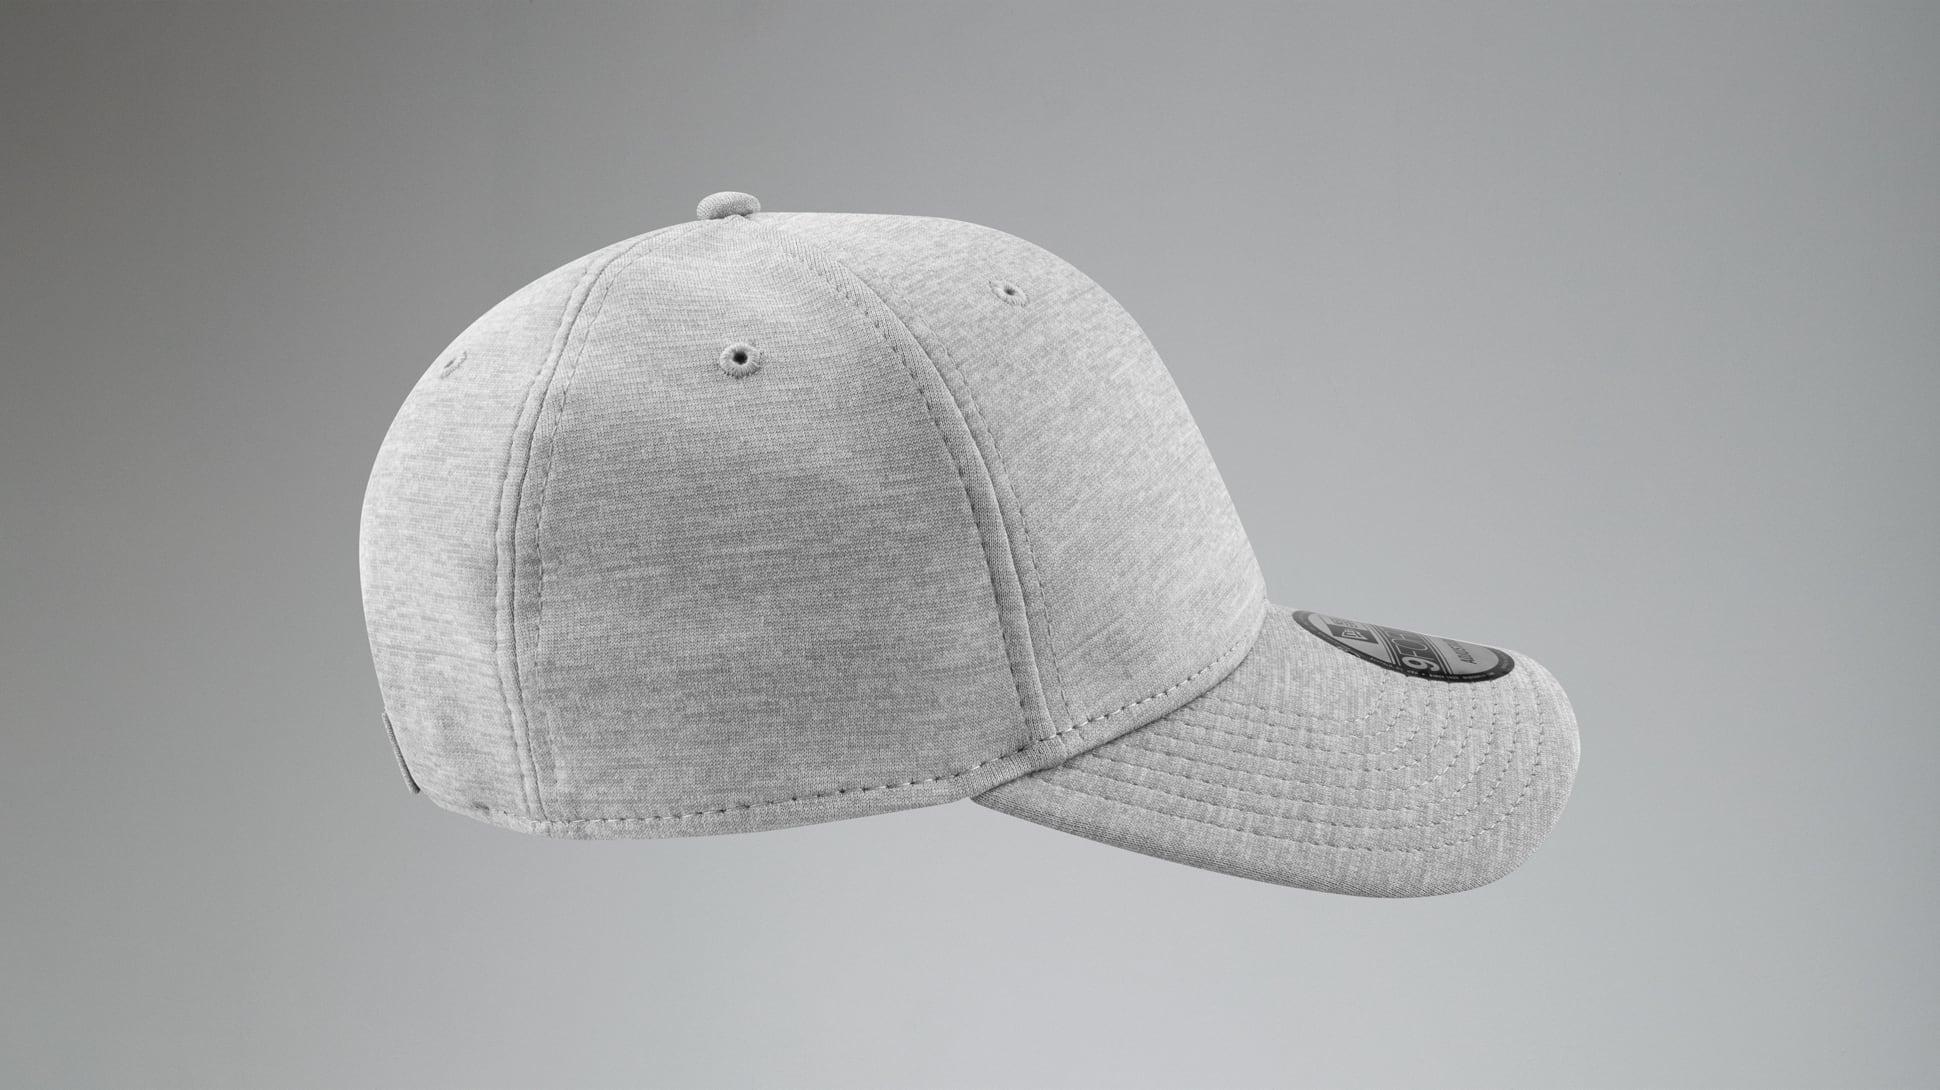 Minimalist 9FORTY Cap Image 3